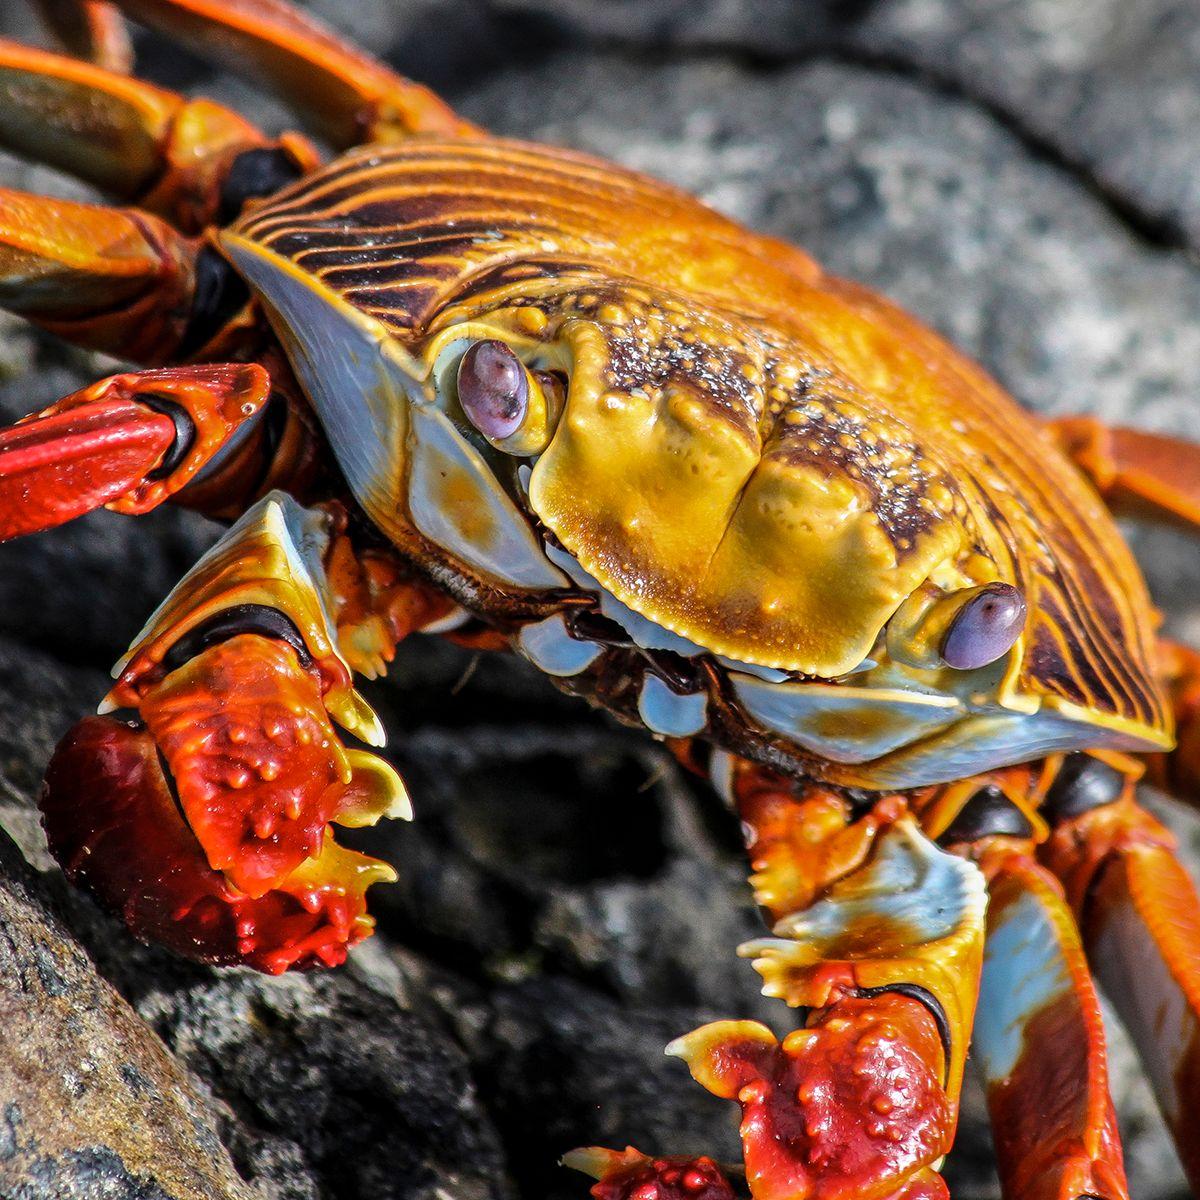 crab_02-2.jpg